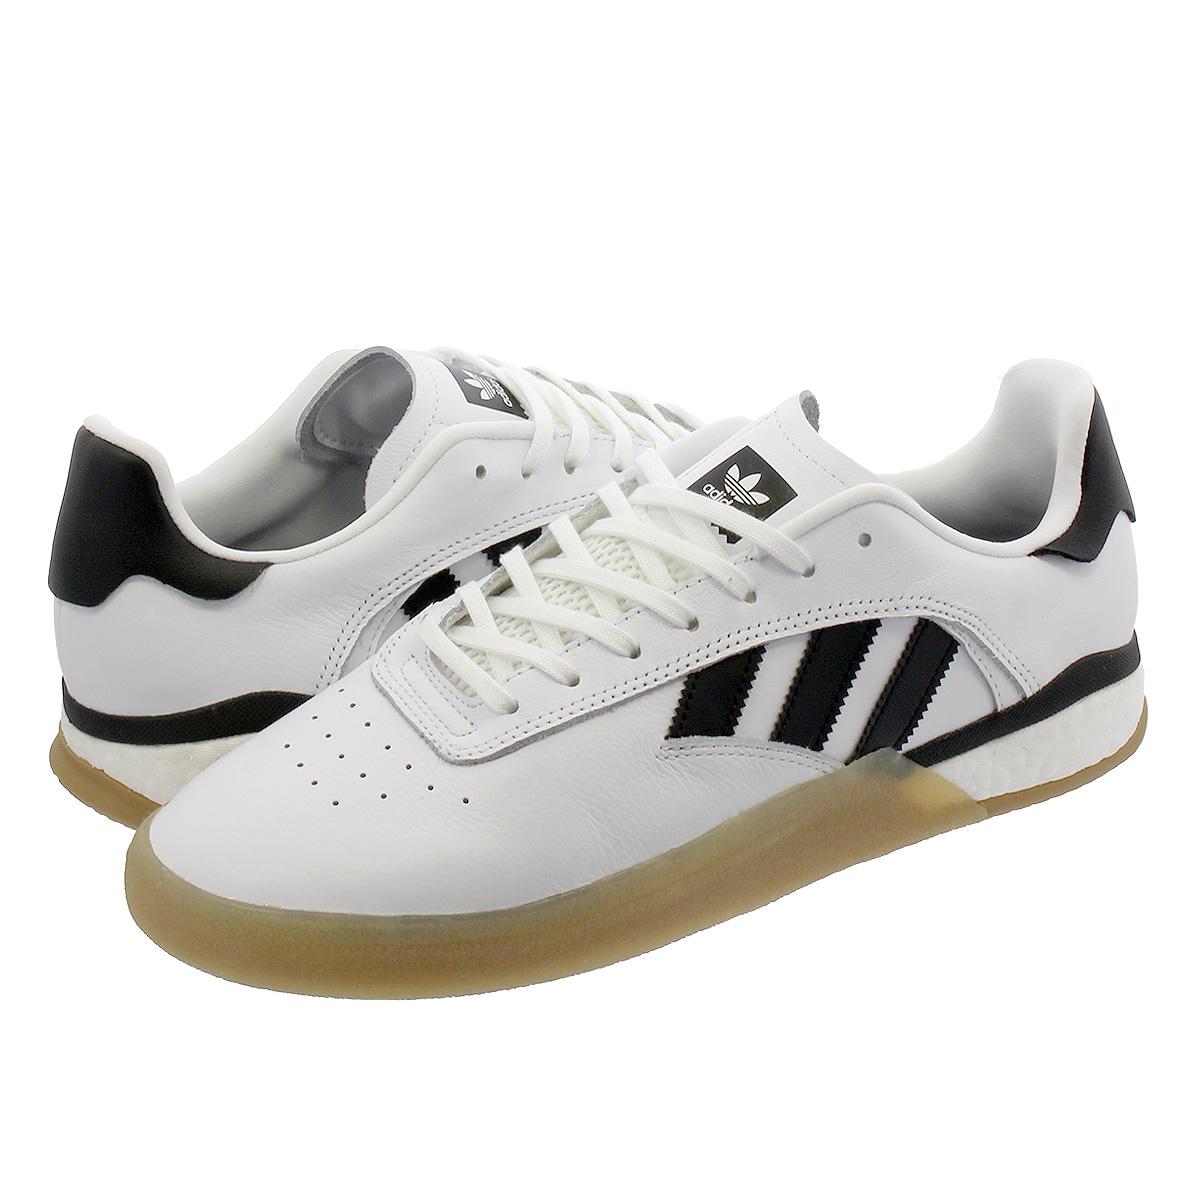 adidas 3ST.004 【adidas Skateboarding】 アディダス 3ST.004 RUNNING WHITE/CORE BLACK/GUM db3153